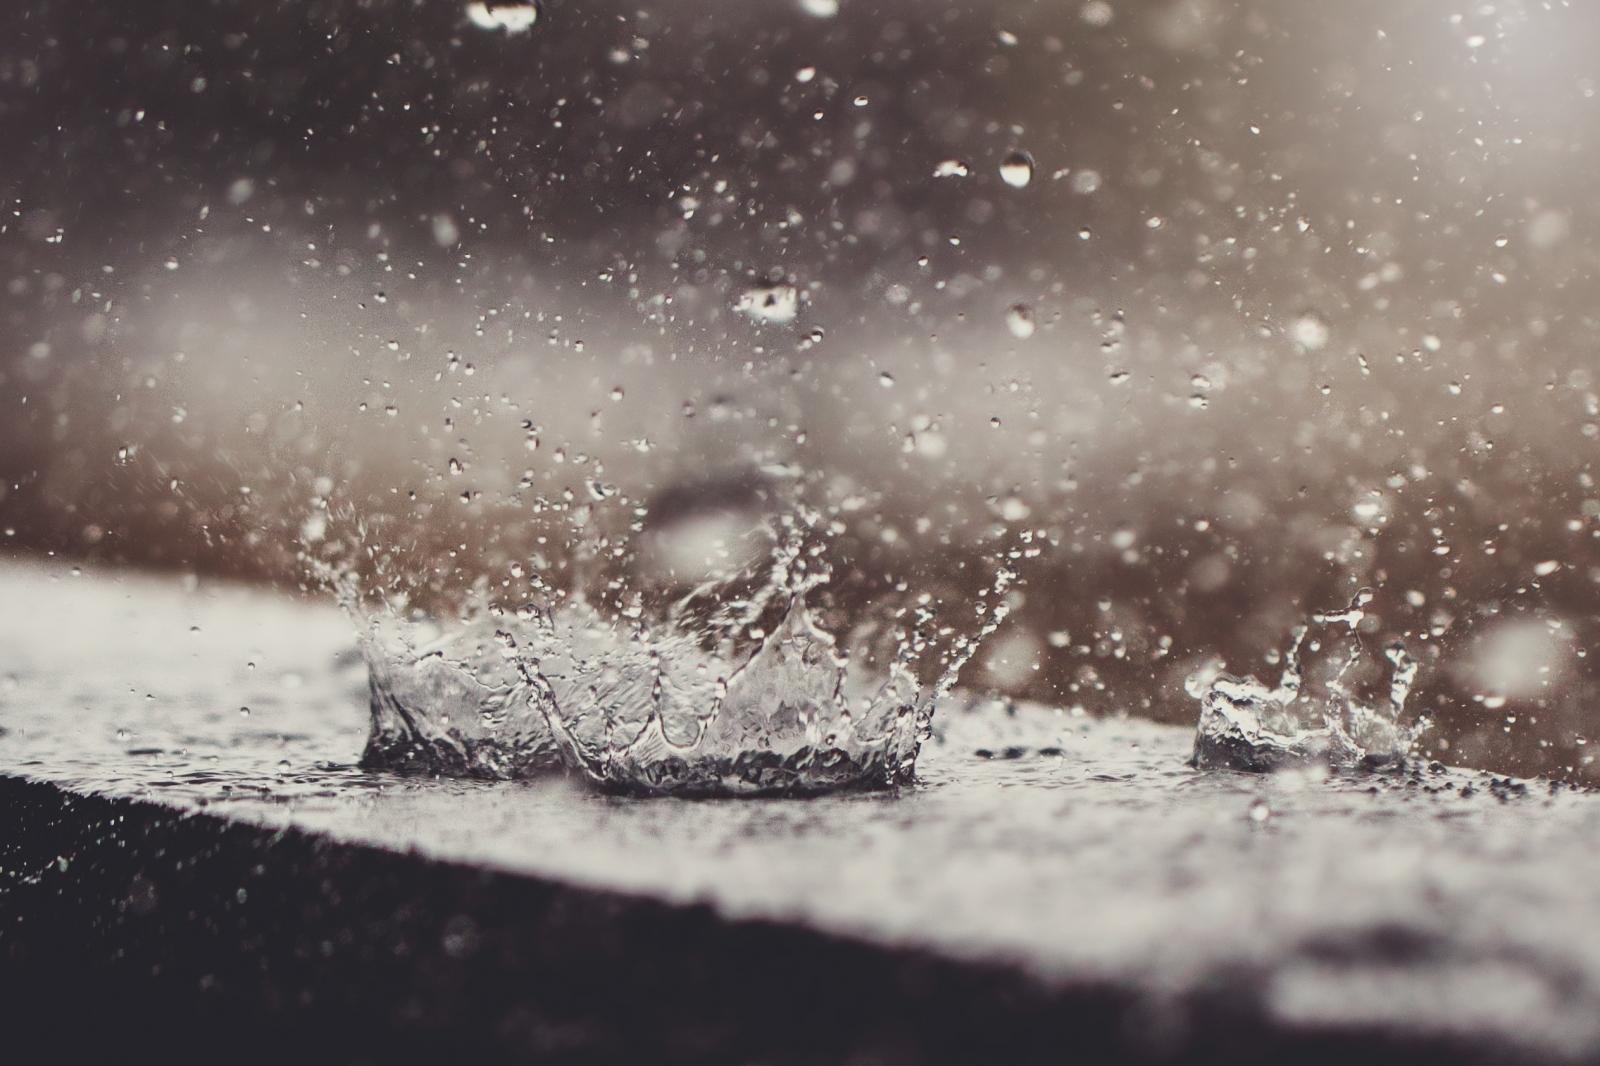 Raindrops hit a surface